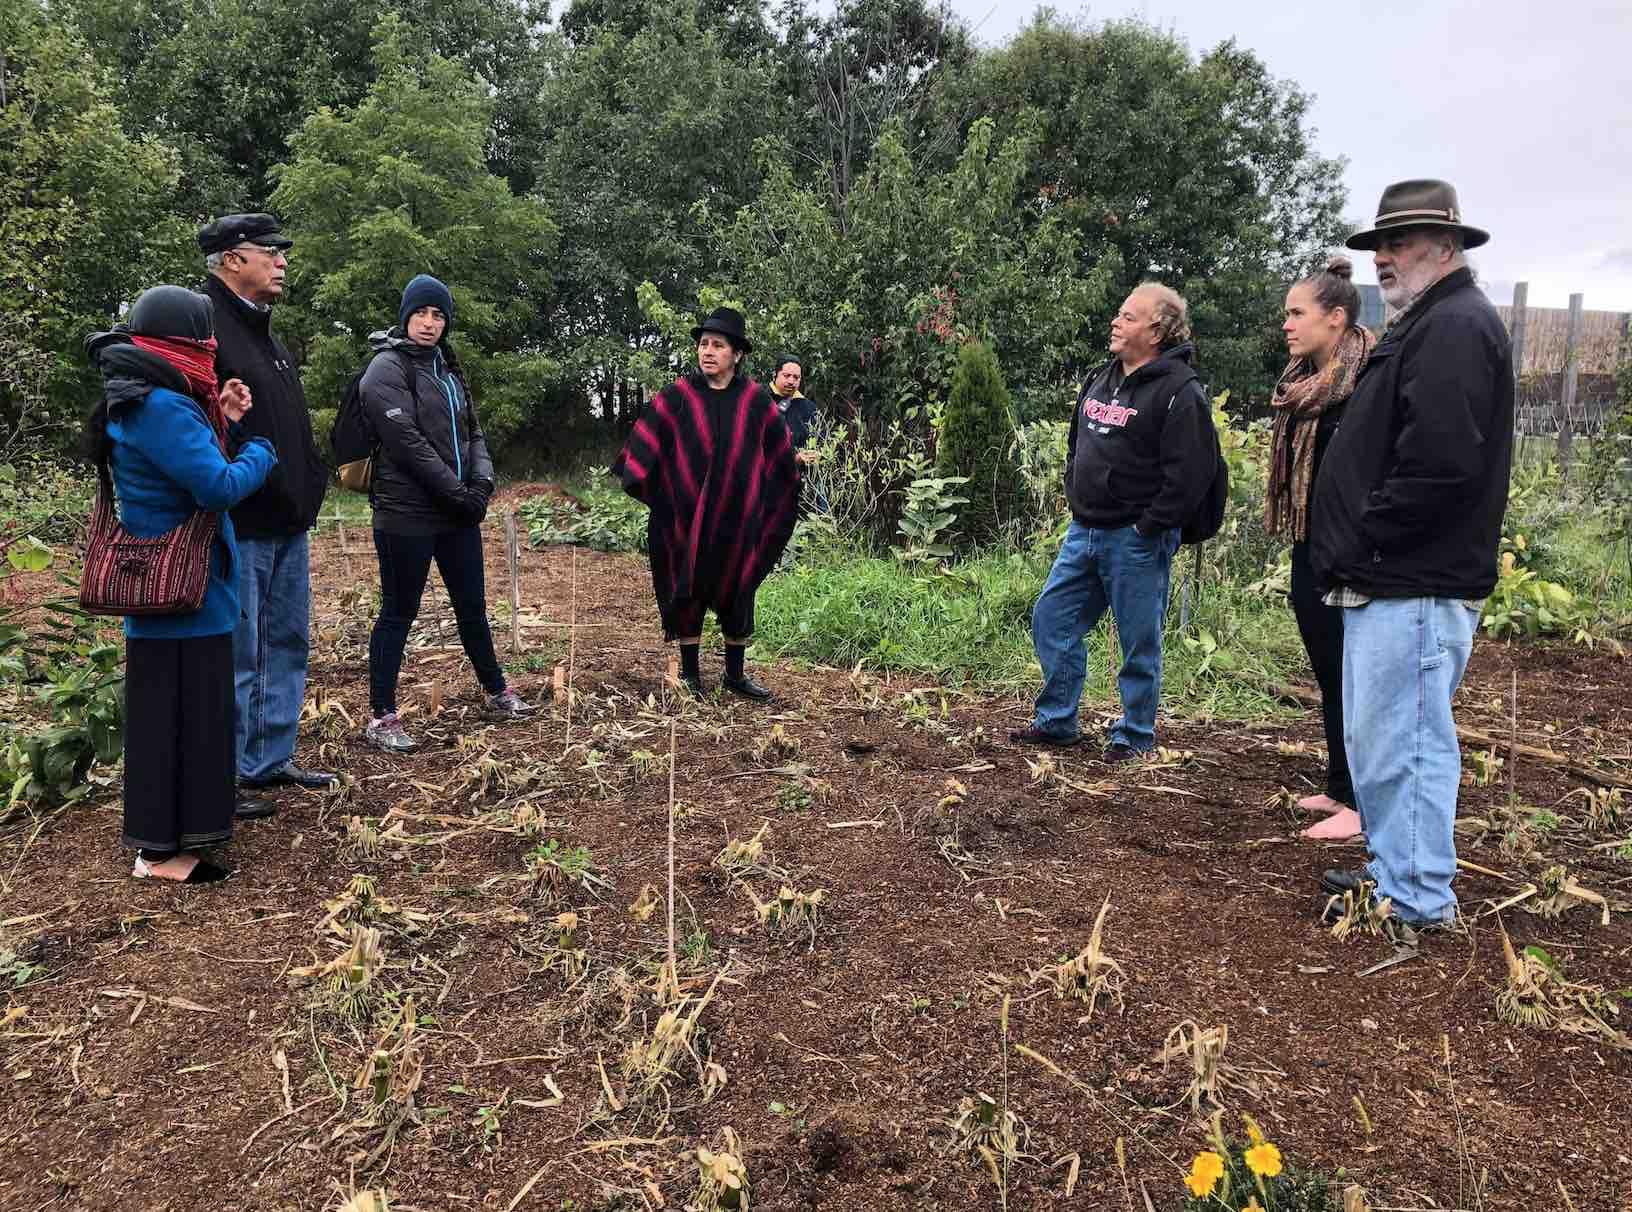 Native american healing garden